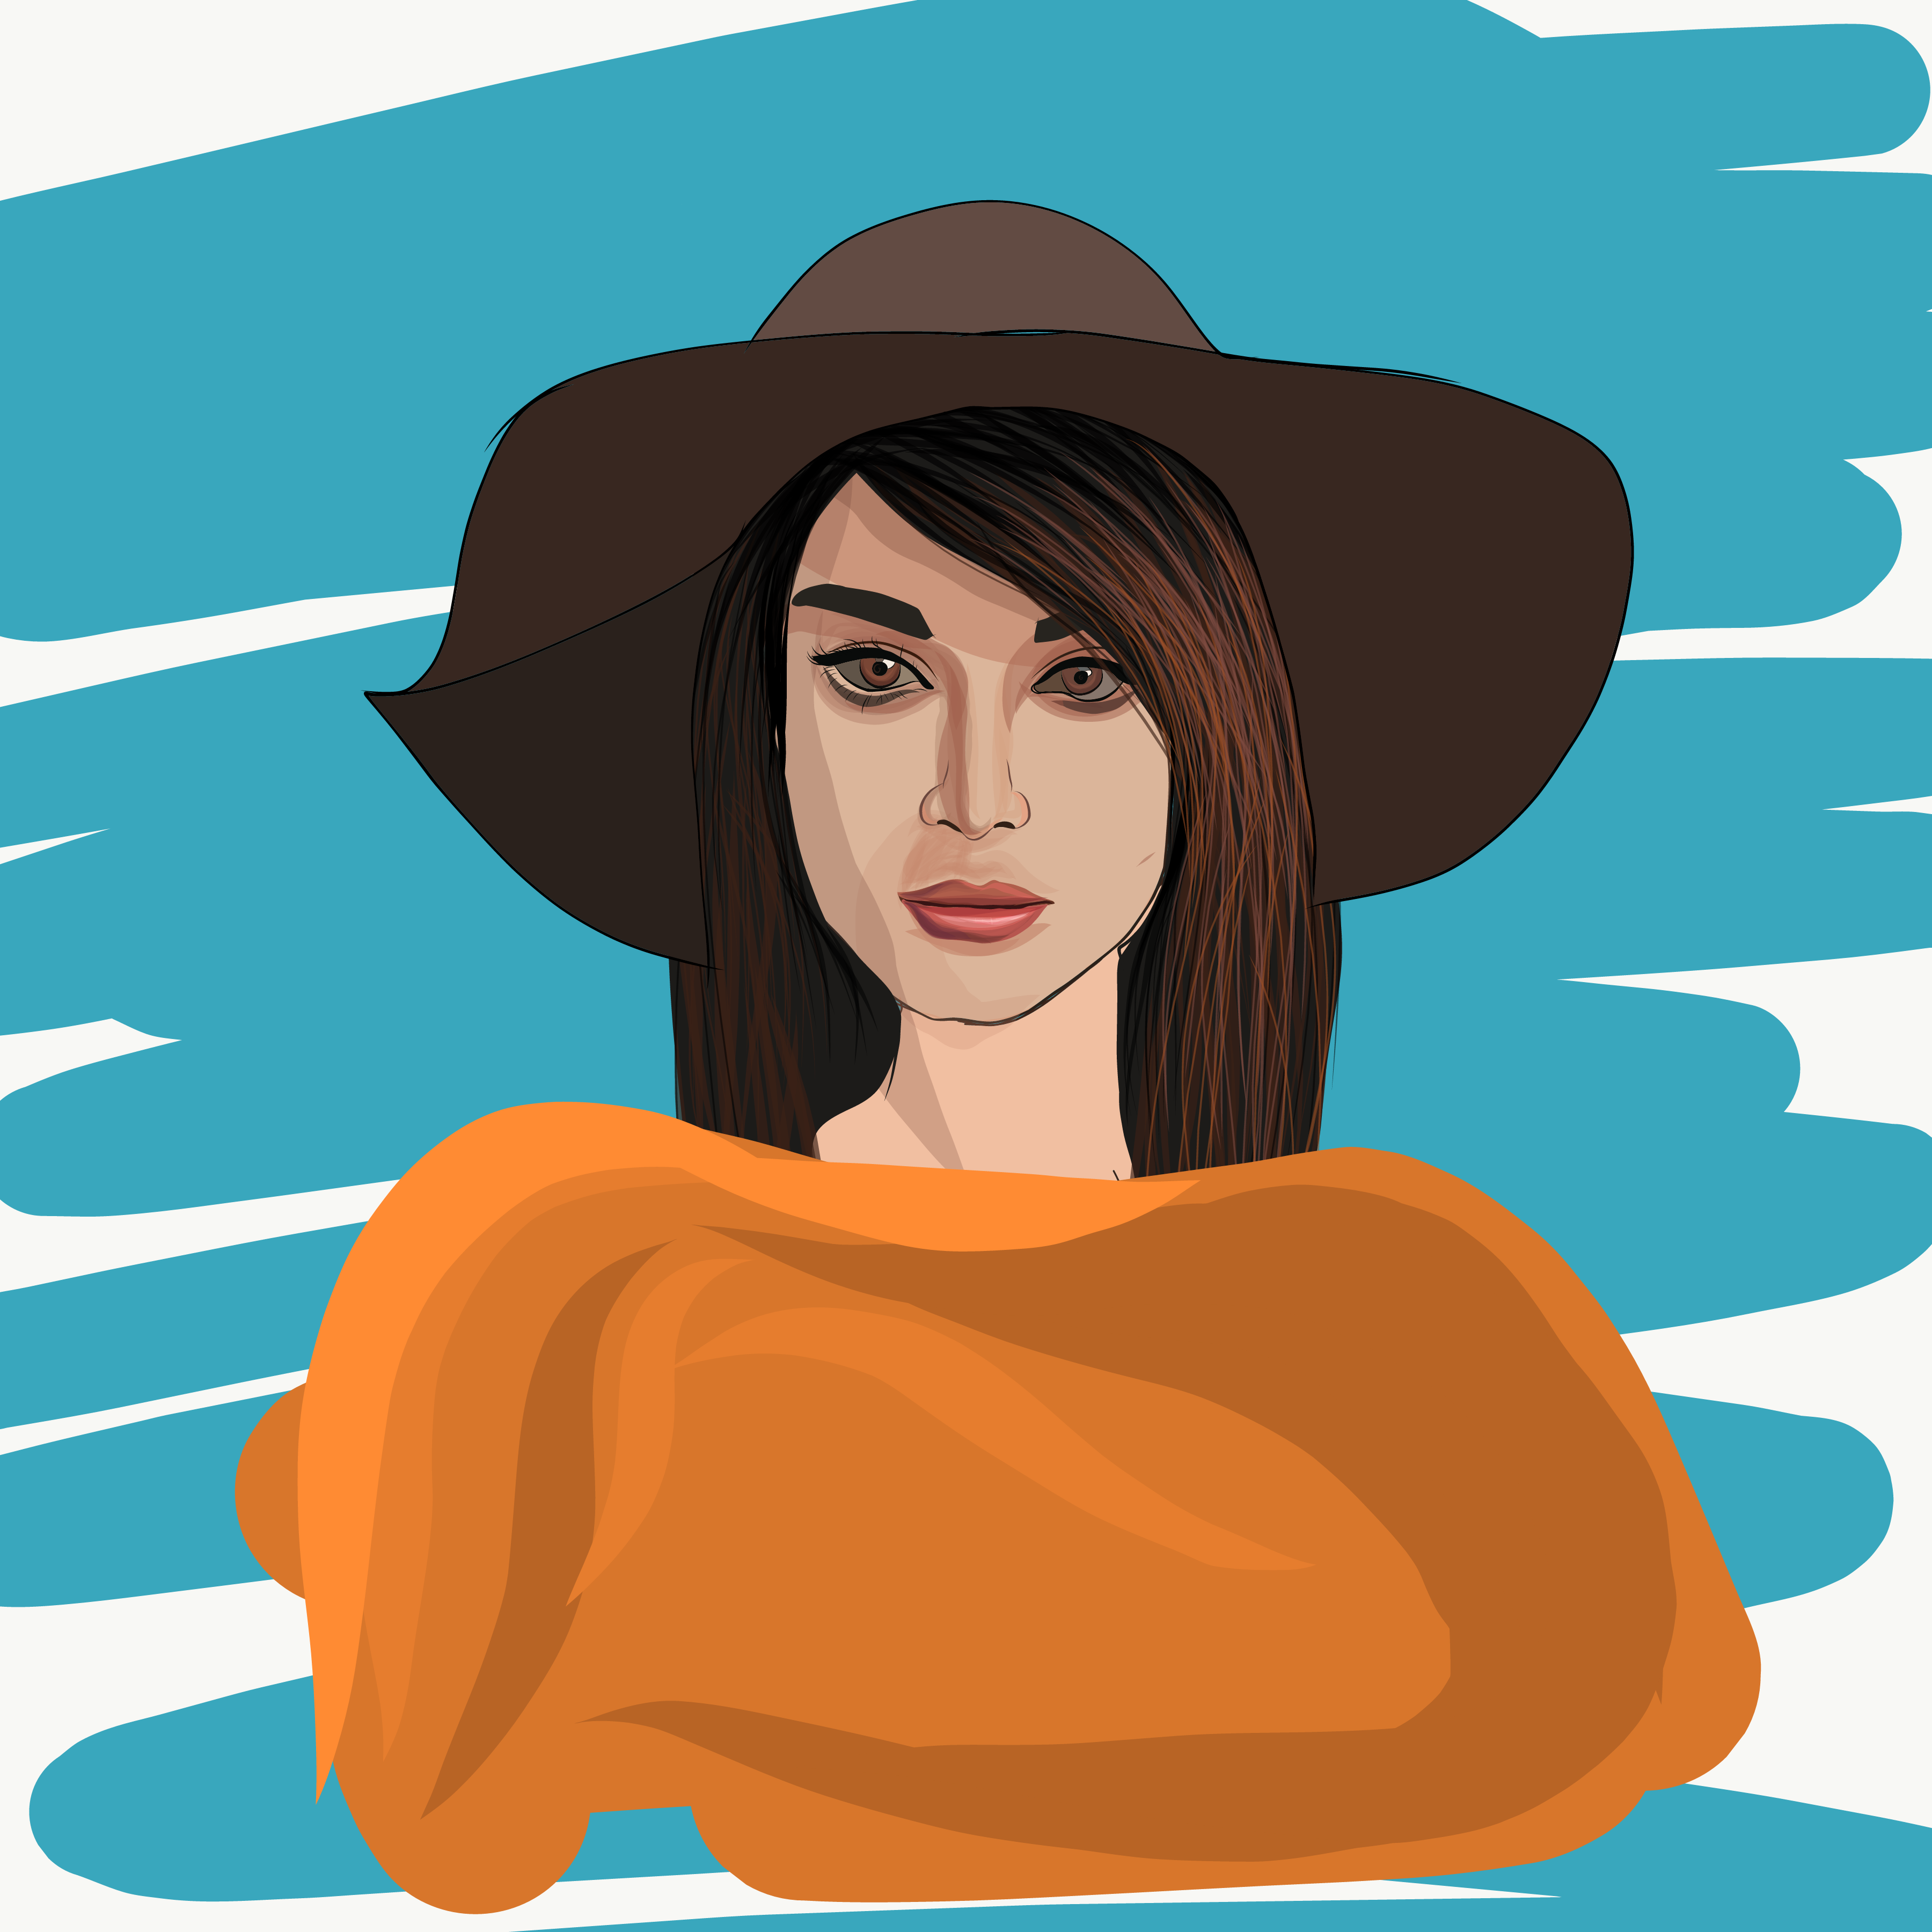 Illustration of a stylish girl